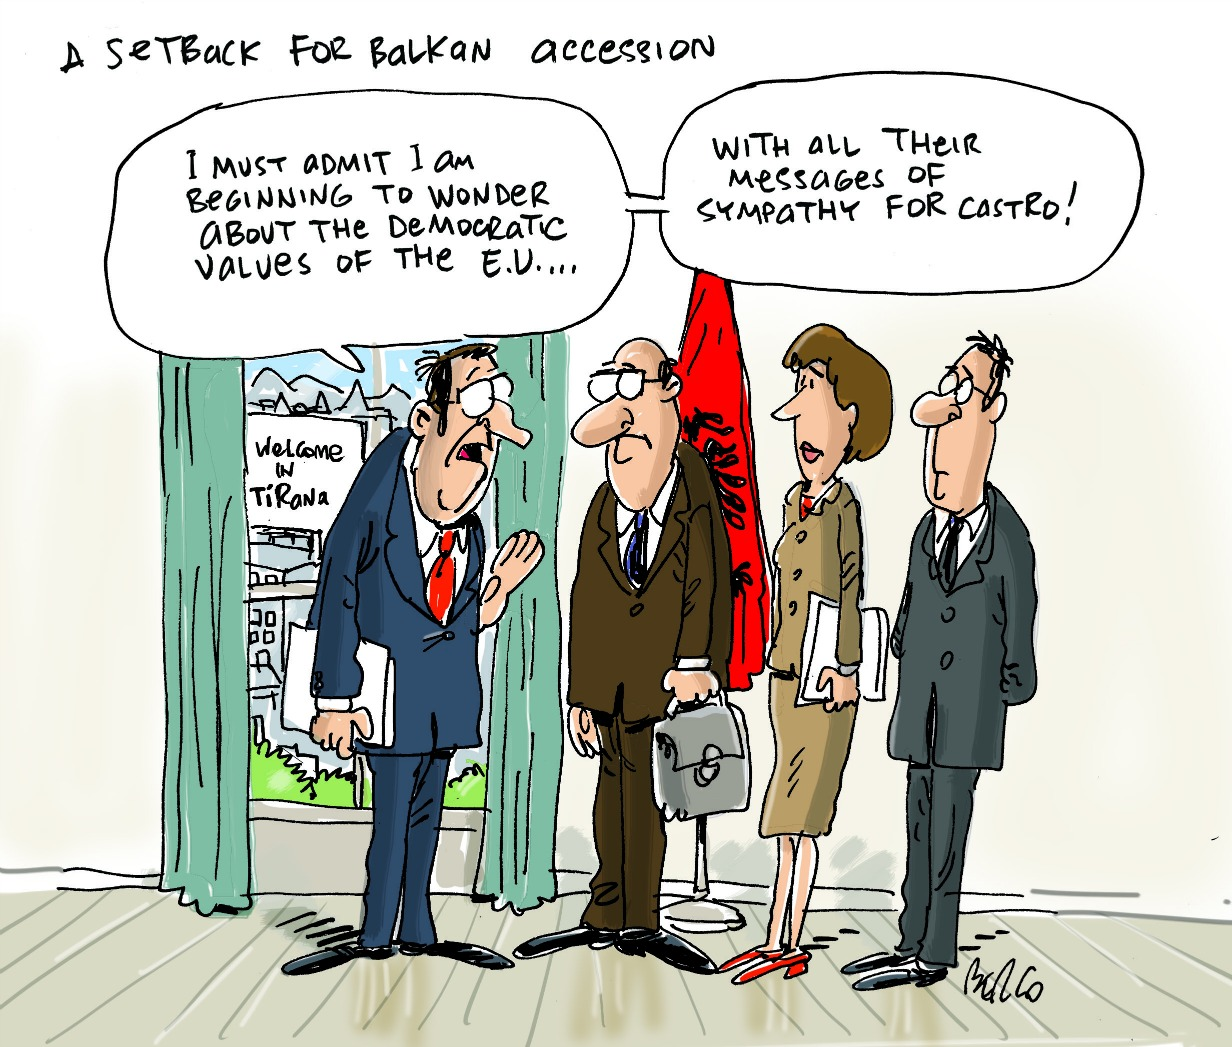 balkan-accession-cartoon-en-small